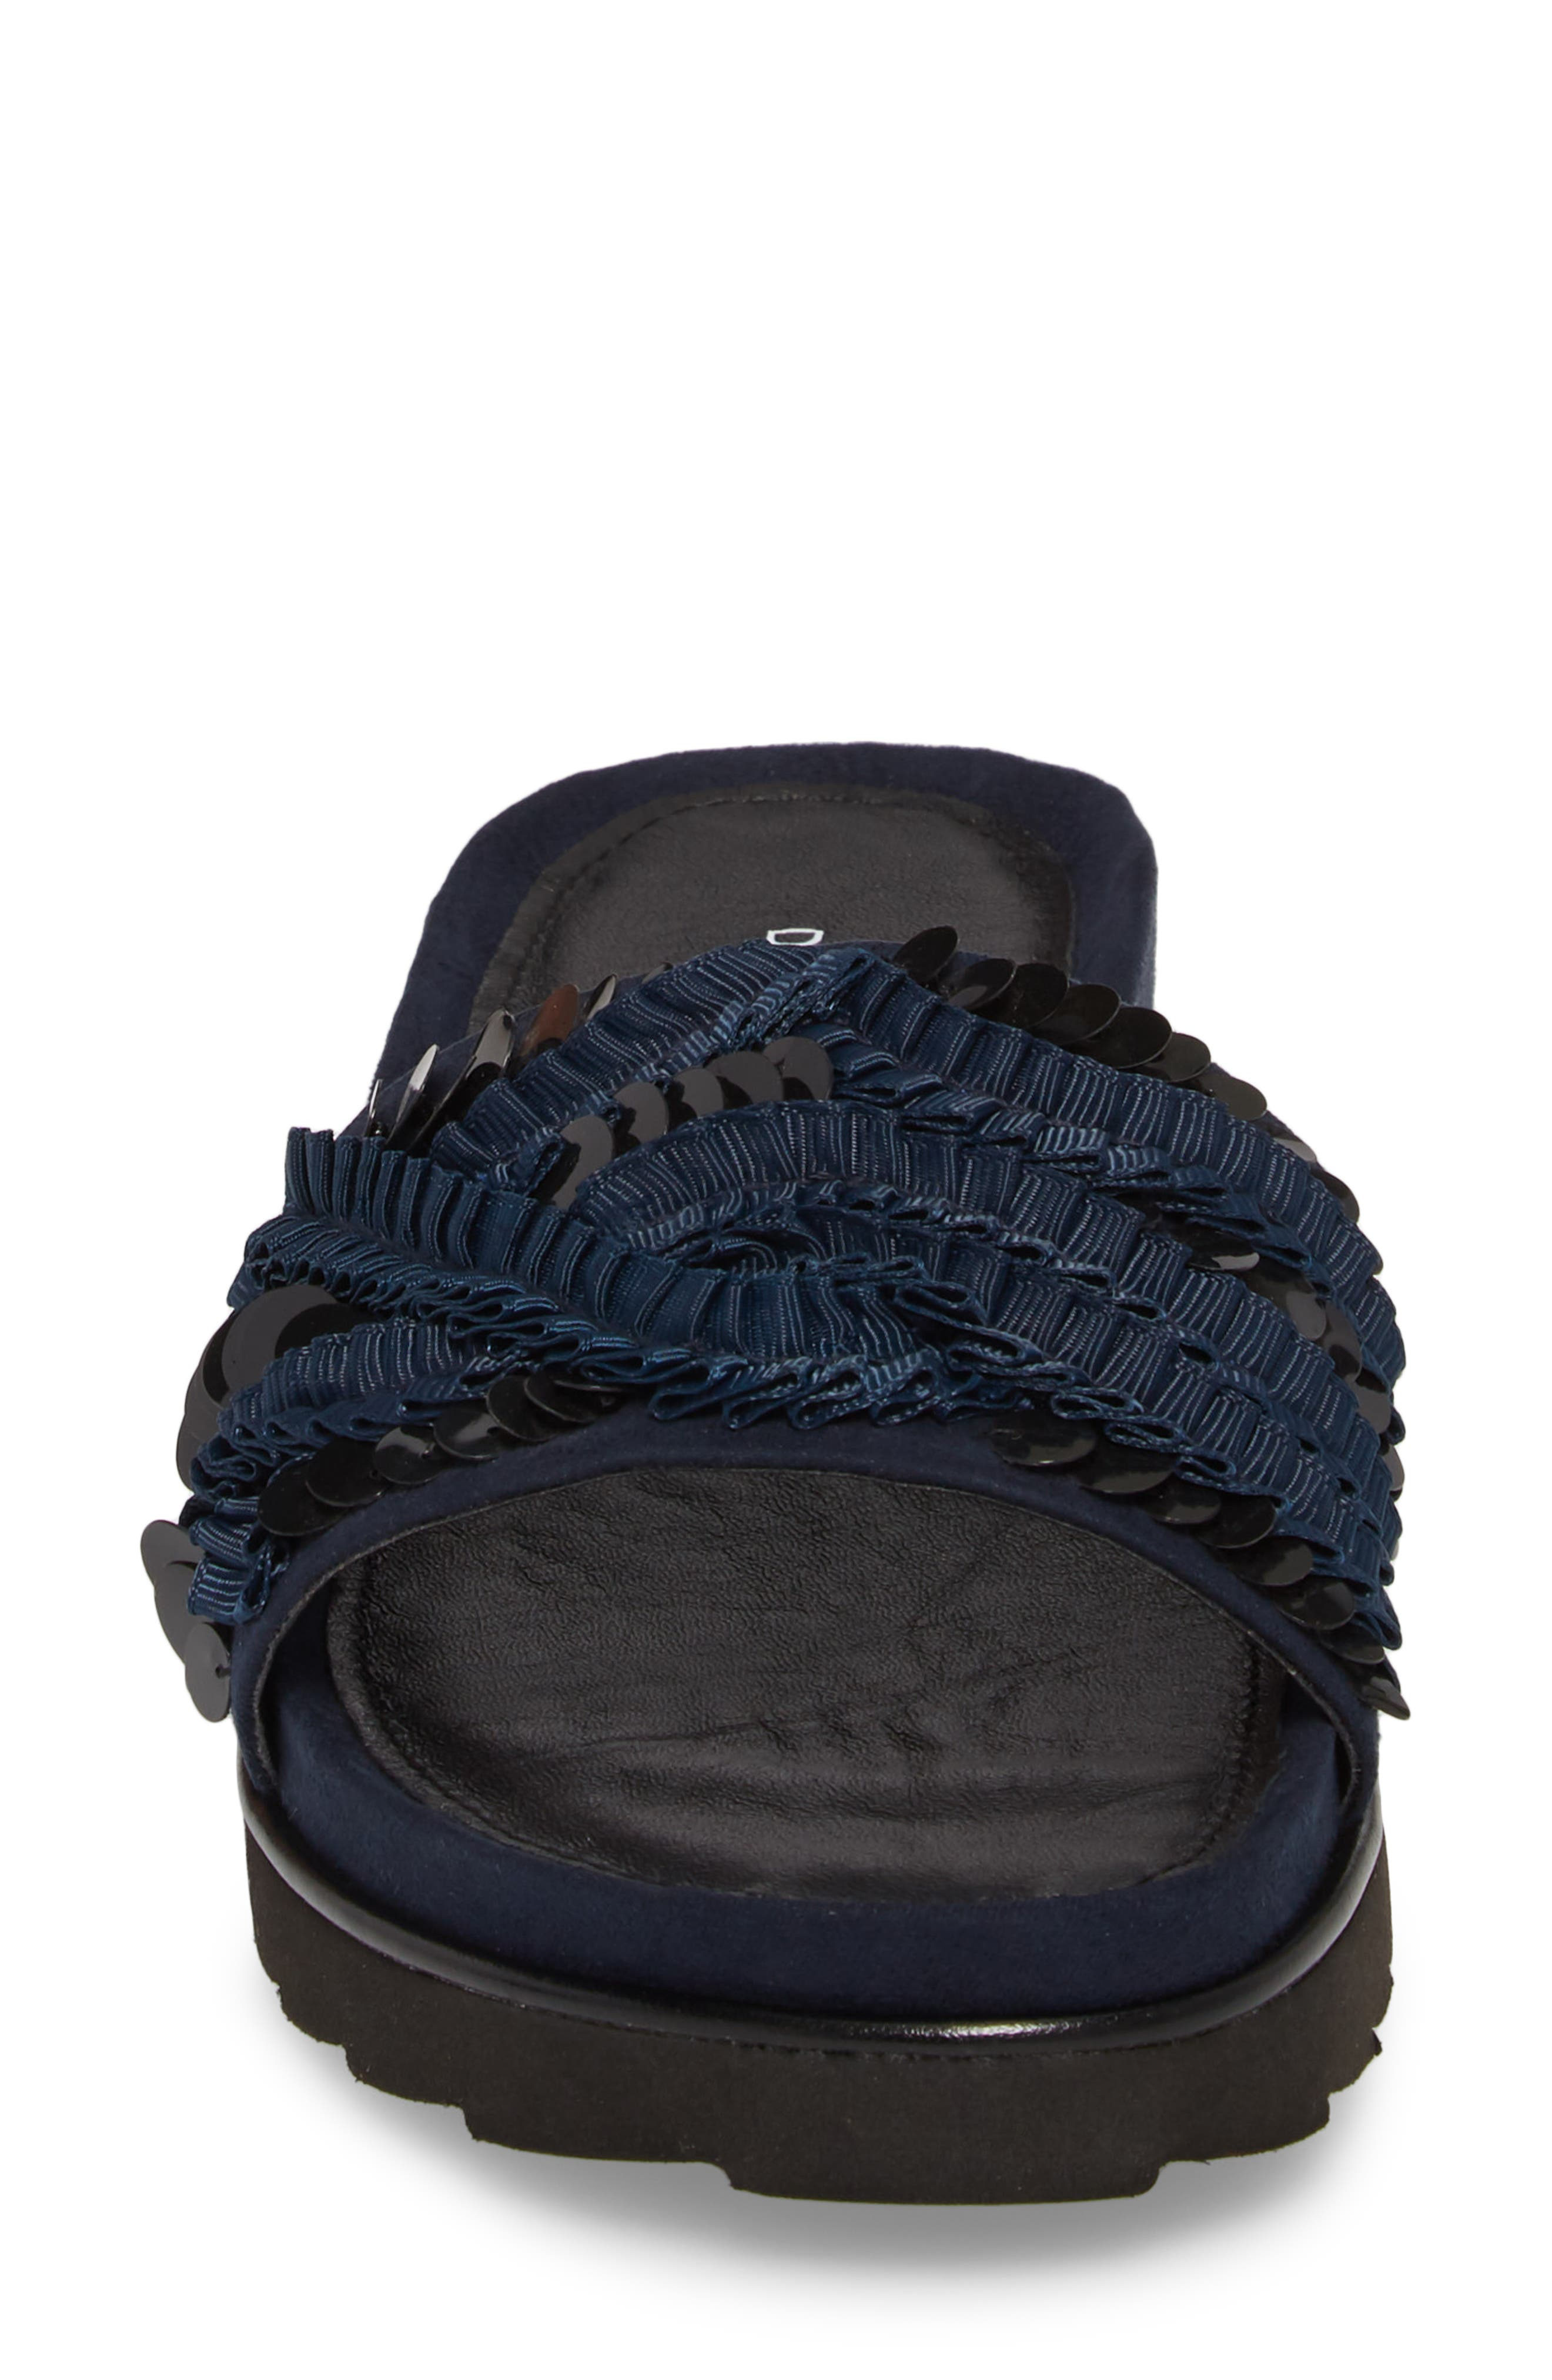 Cava Slide Sandal,                             Alternate thumbnail 4, color,                             NAVY SUEDE